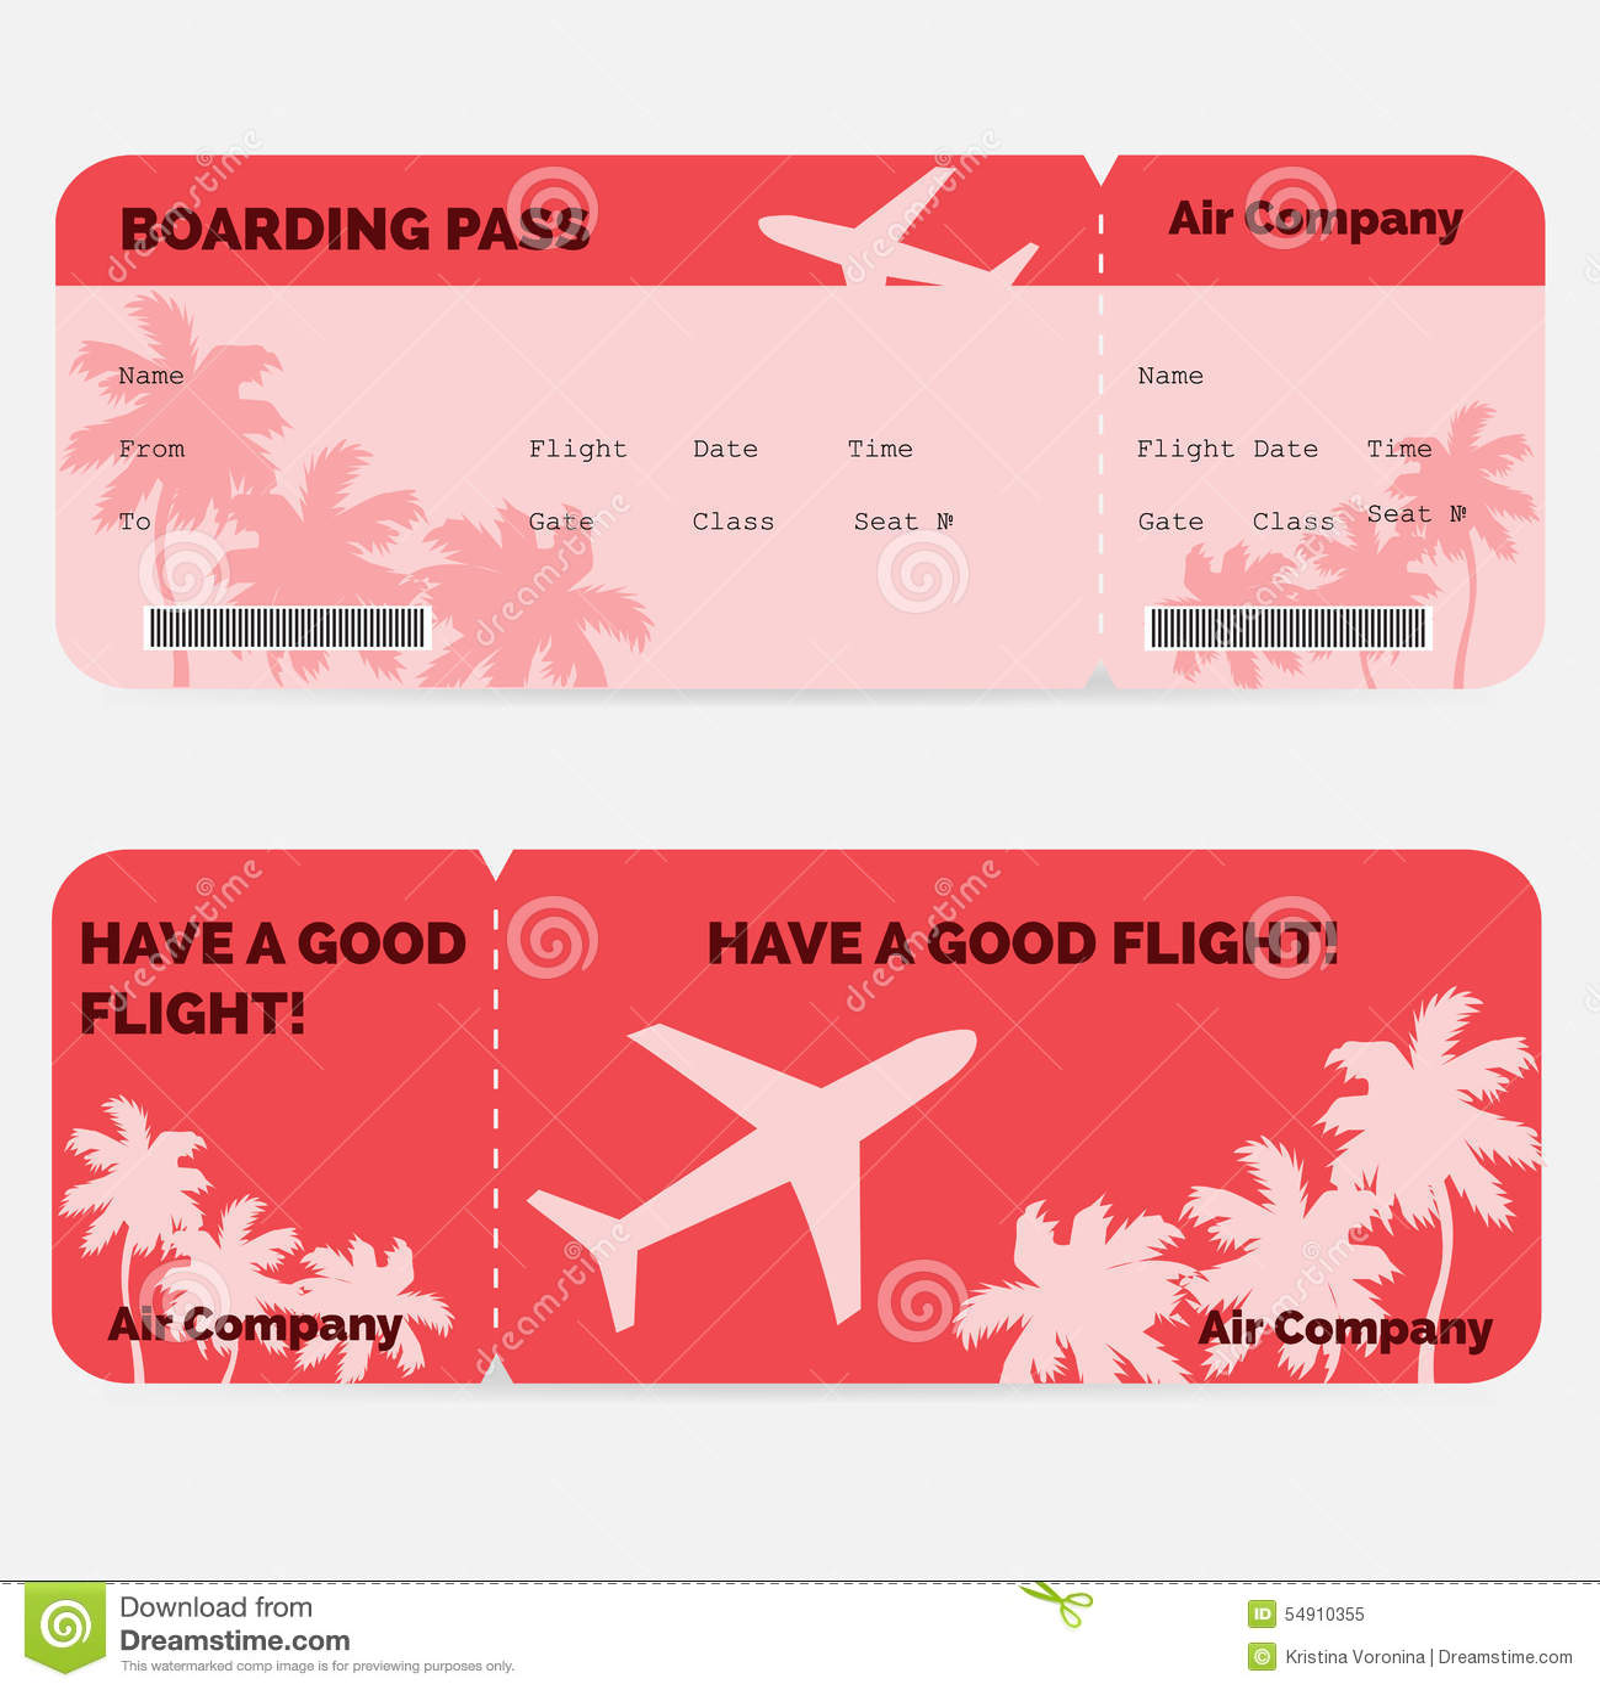 Boarding pass invitation template free - visualbrains.info